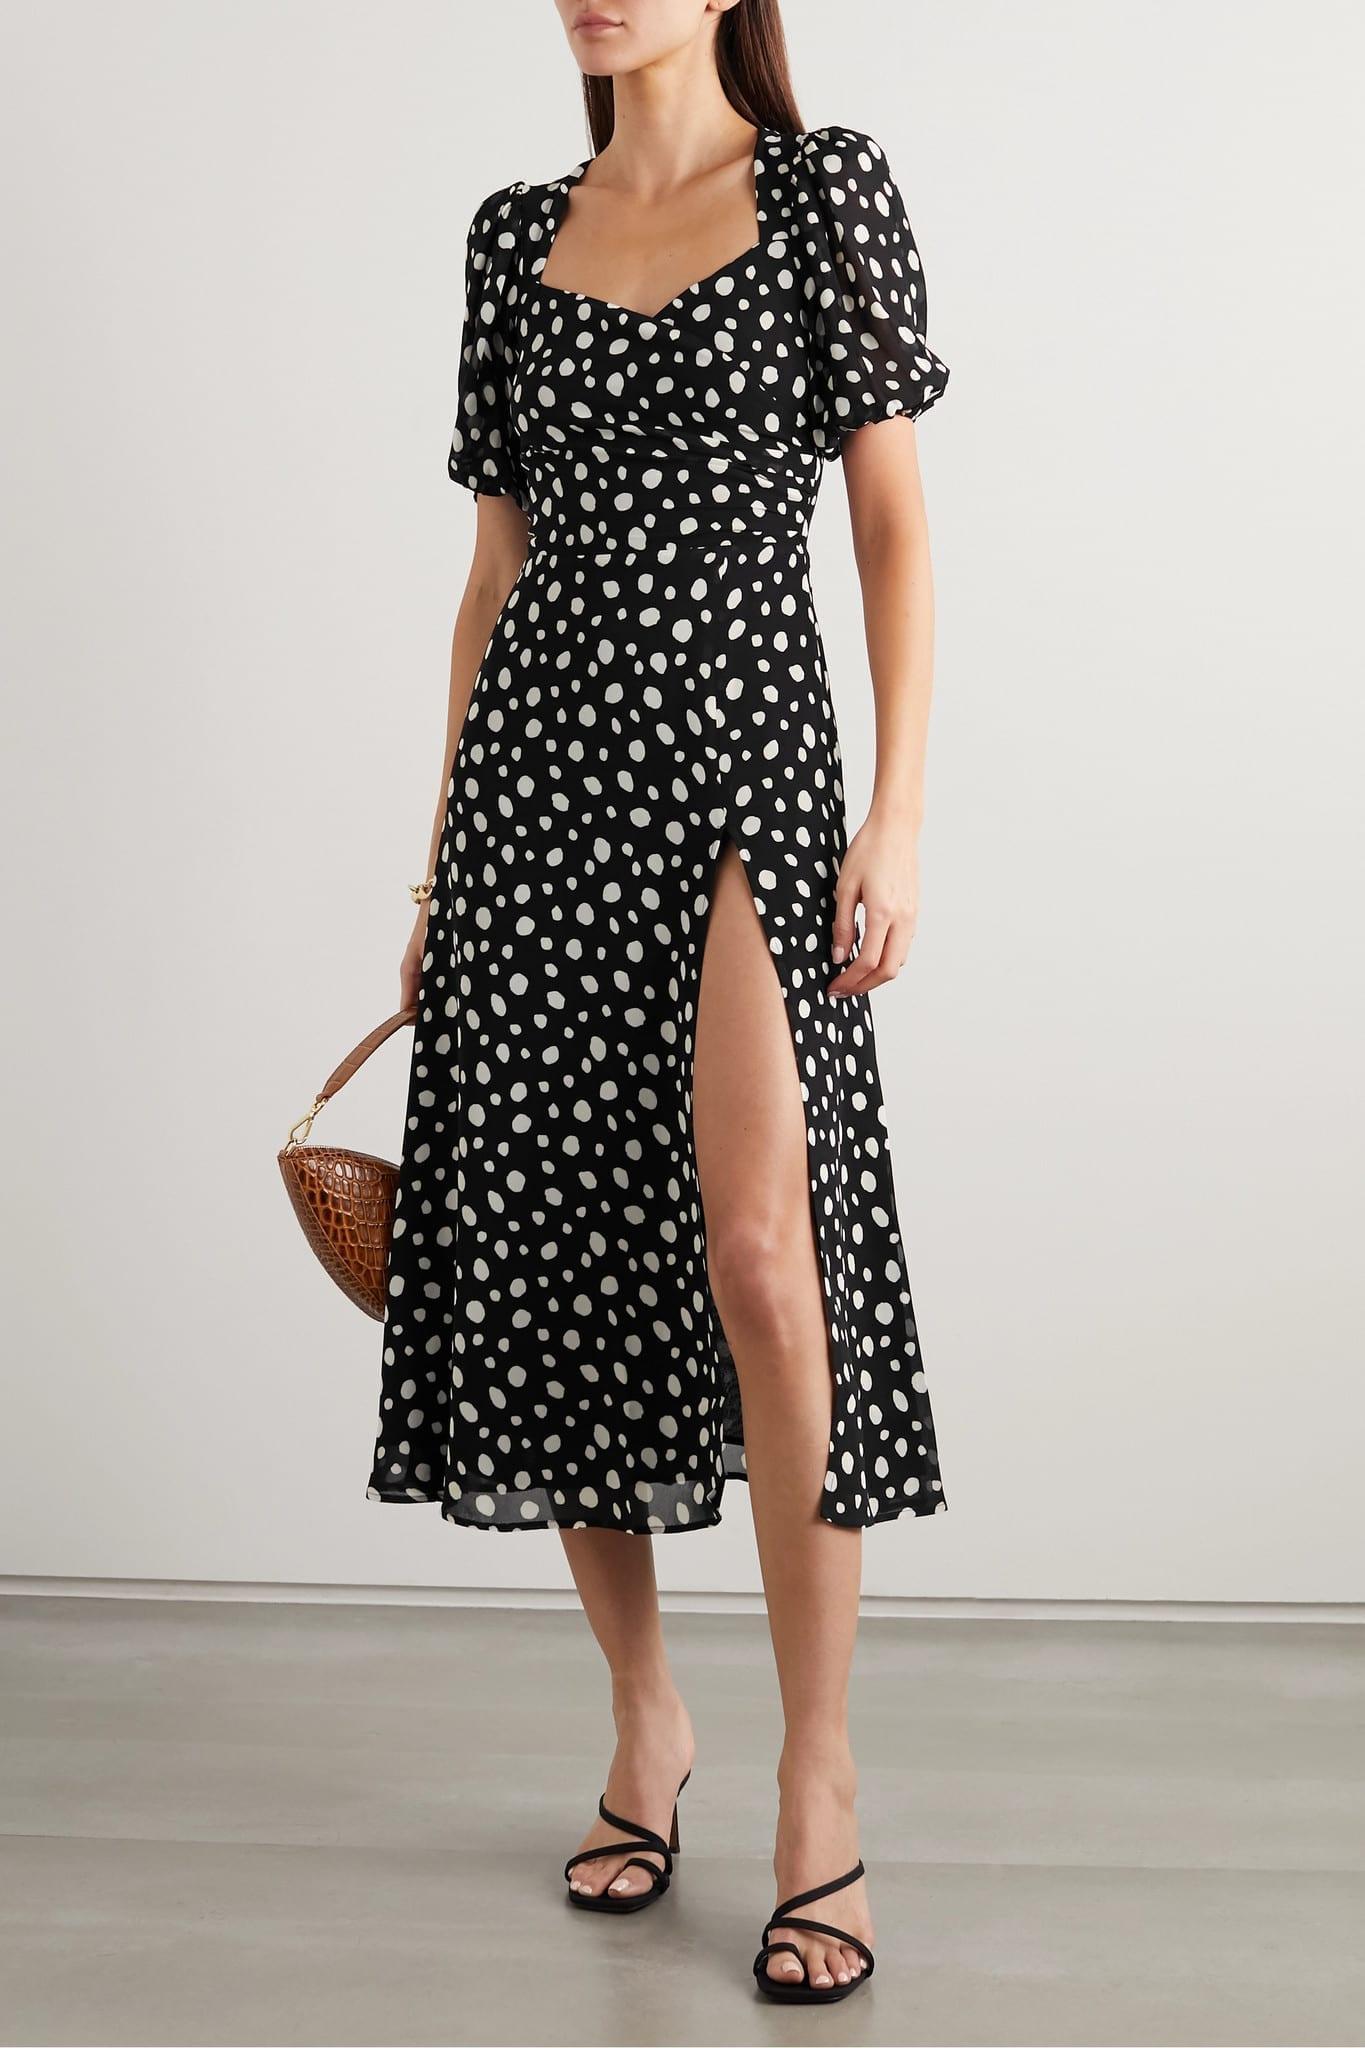 REFORMATION + Net Sustain Wildflower Polka-dot Georgette Midi Dress